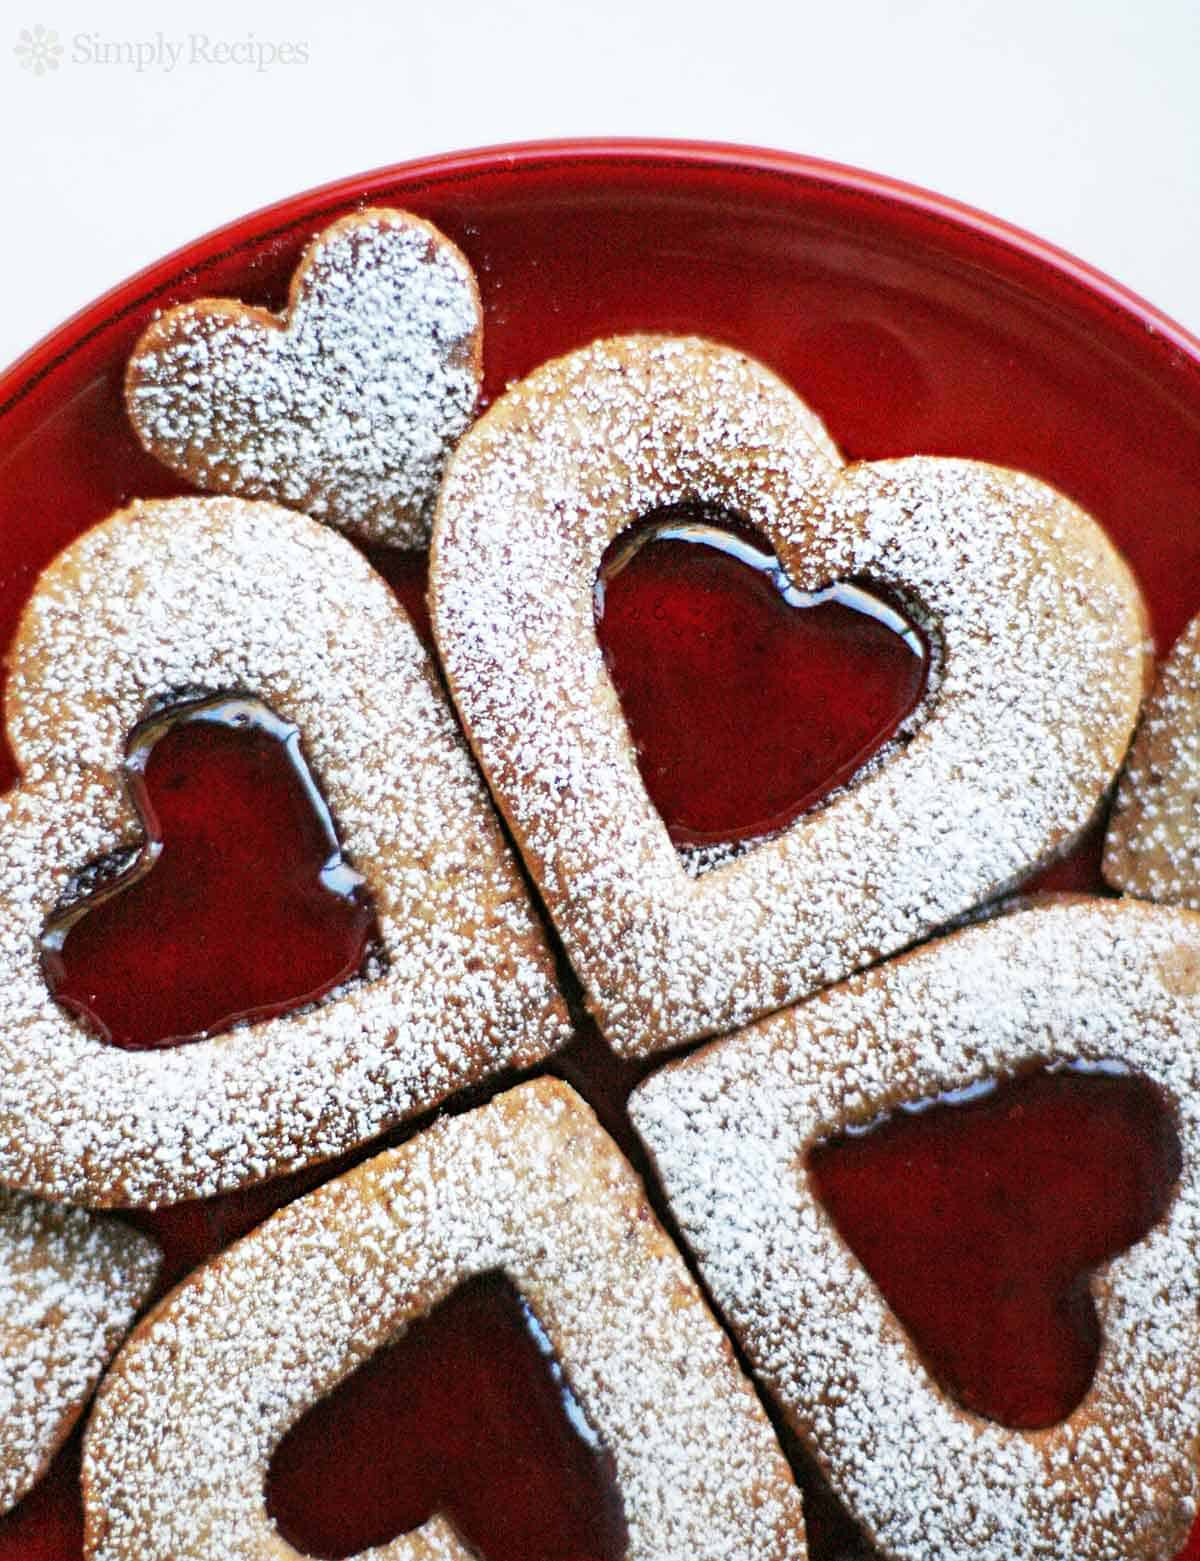 Homemade Valentine's Day Linzer cookies